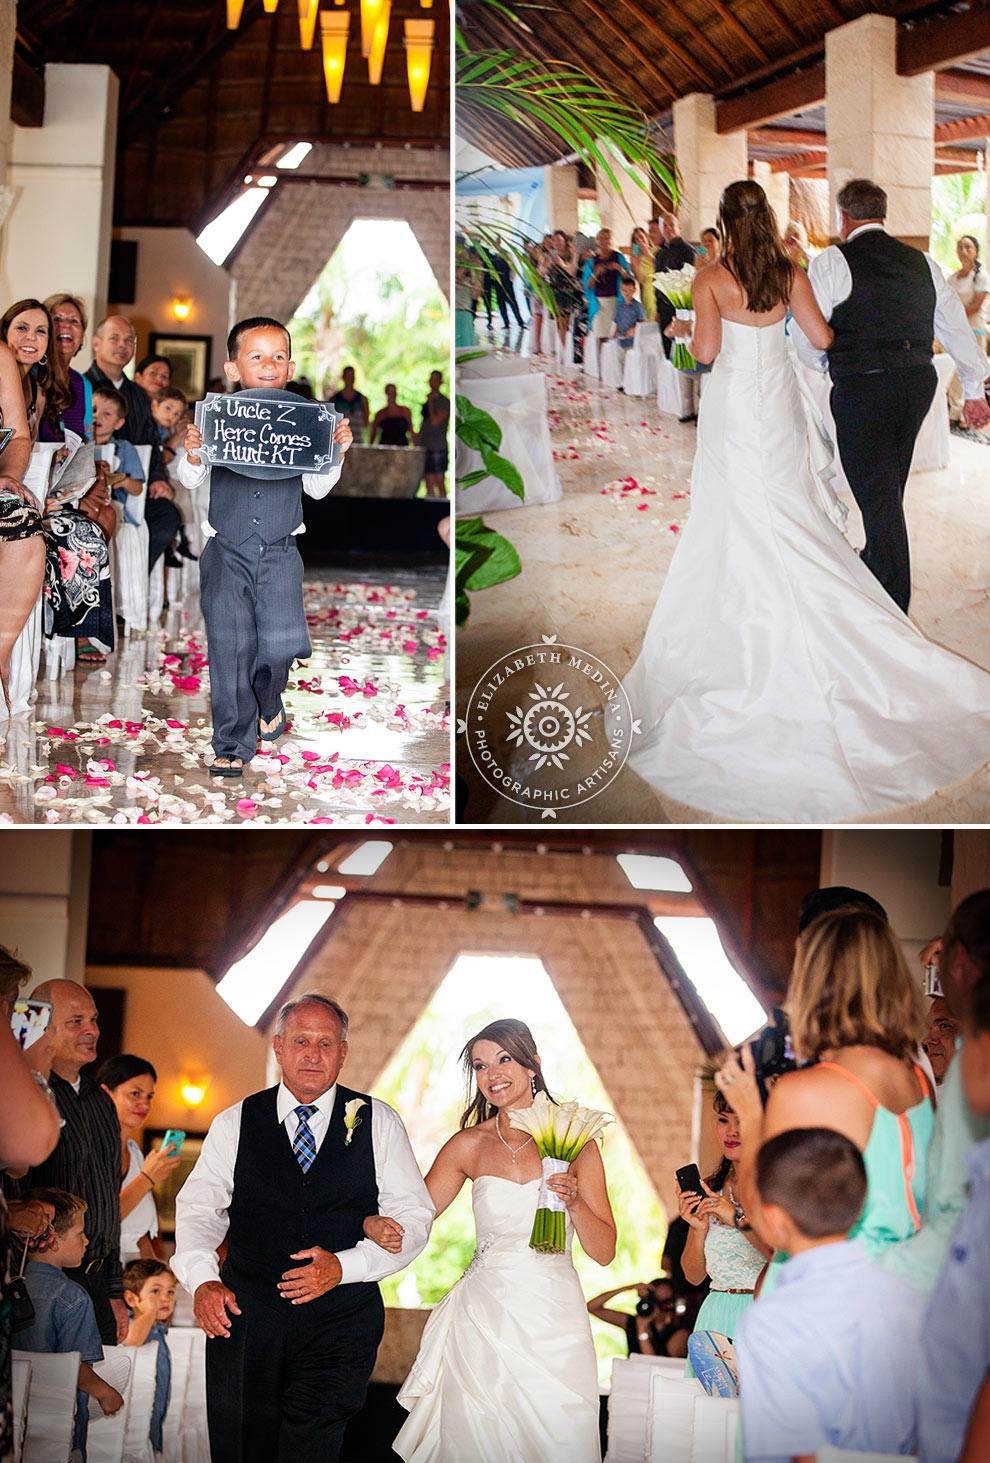 azul_beach_wedding_emedina_0012 Azul Beach Wedding Photography, Katie and Zach